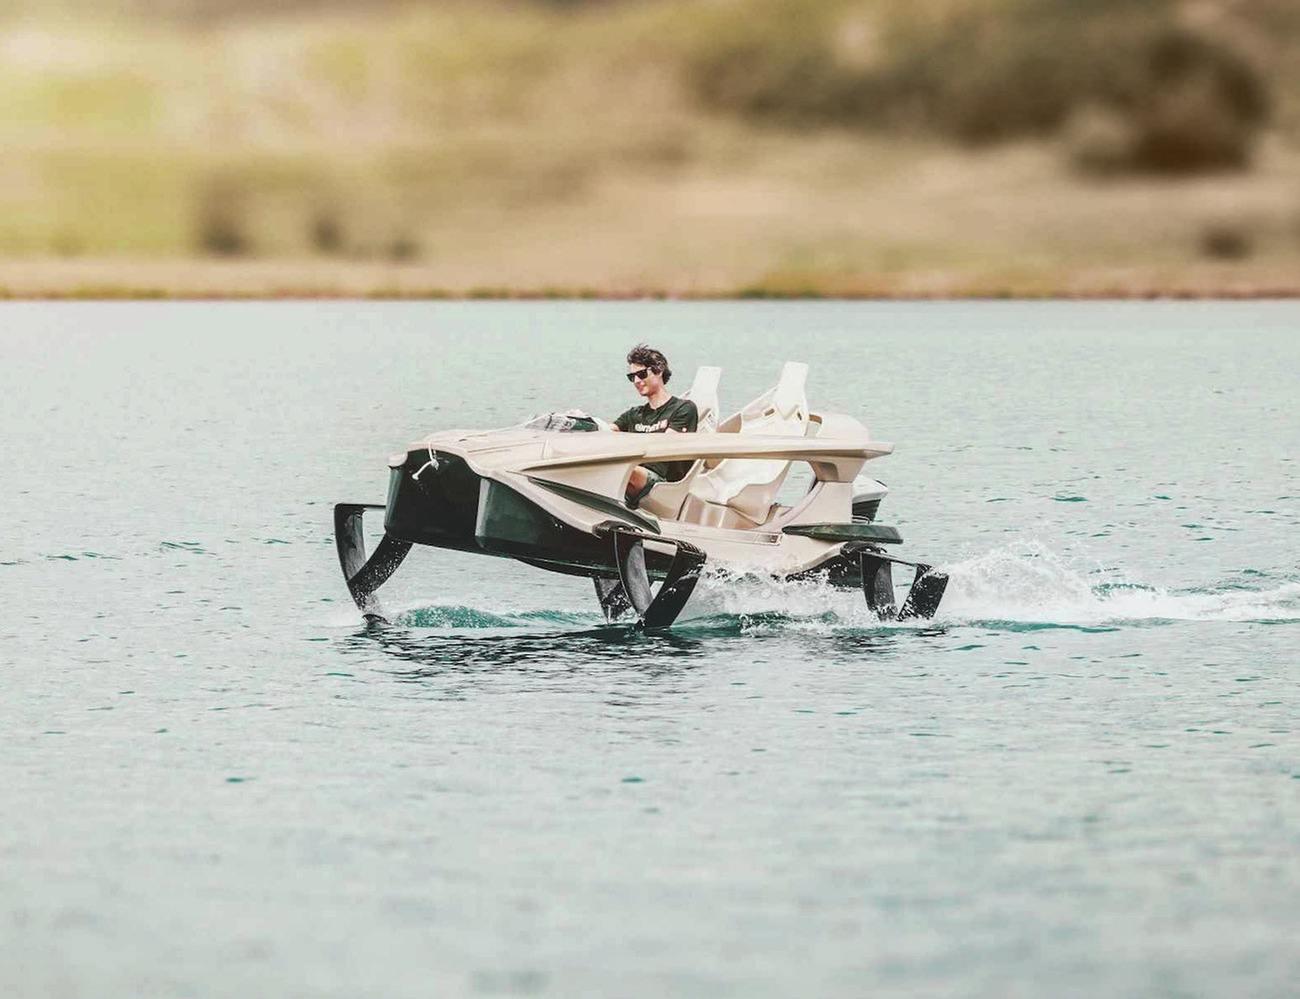 Quadrofoil – 2-Person Electric Watercraft